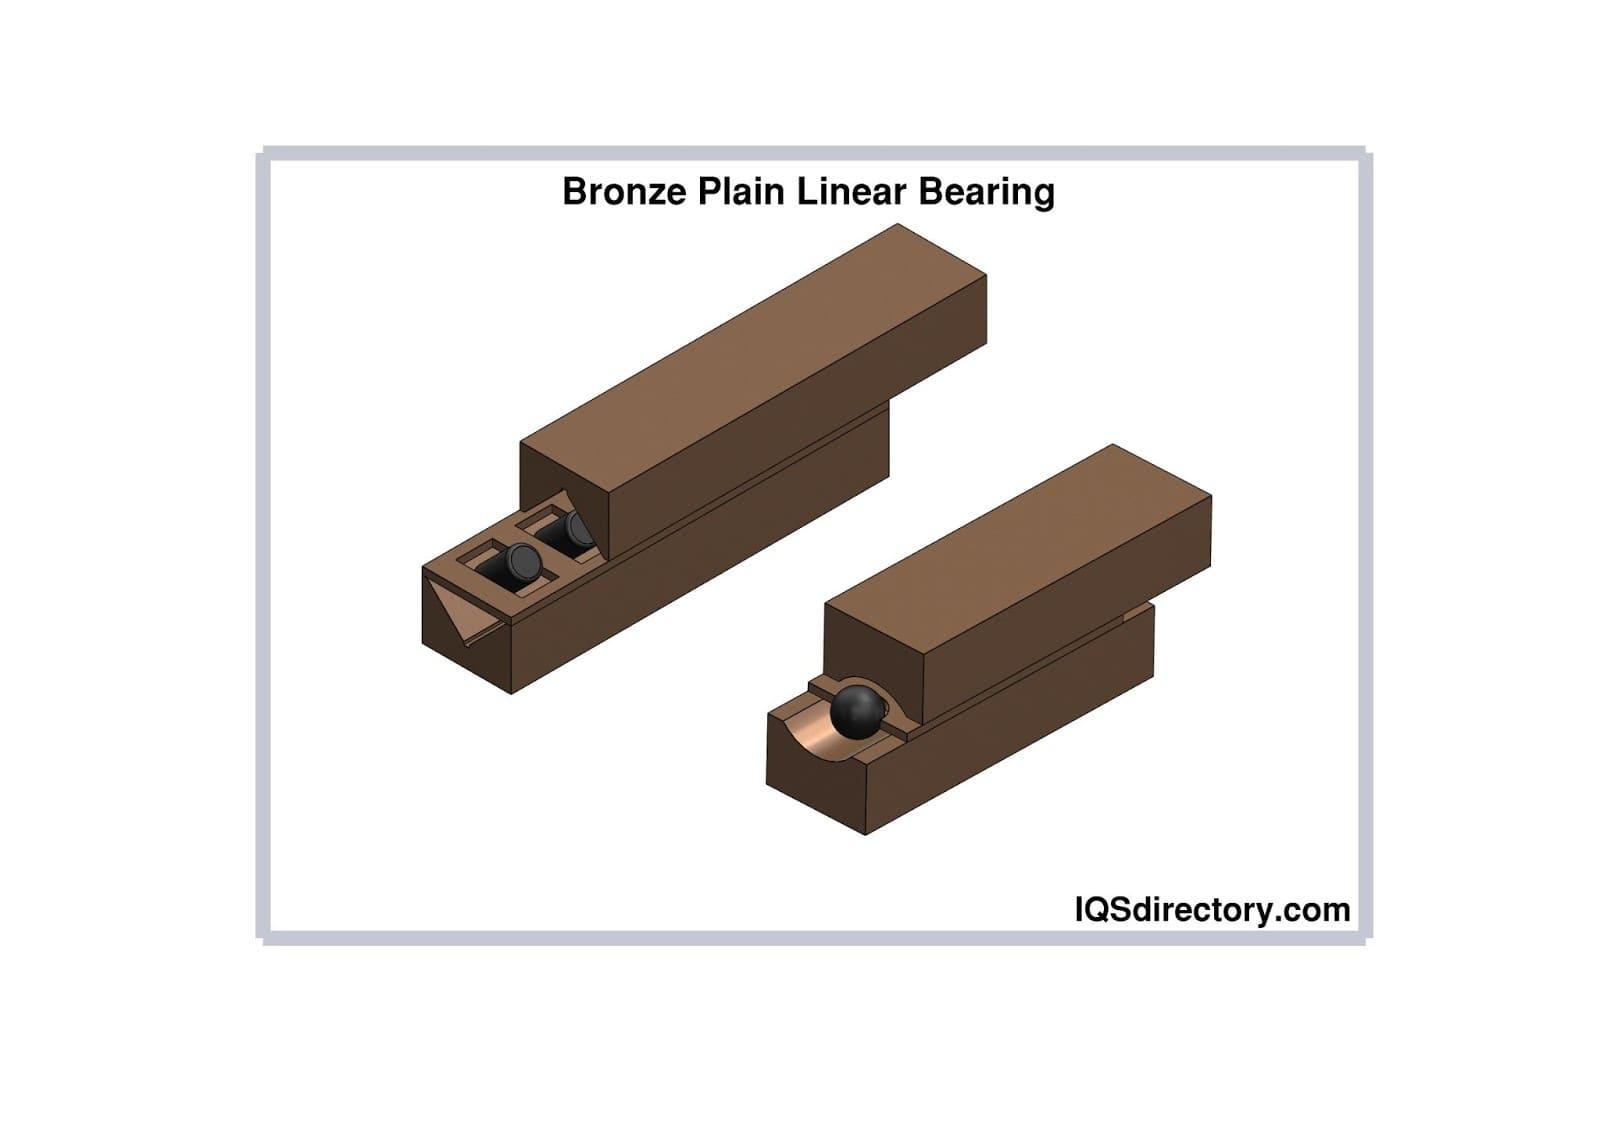 Bronze Plain Linear Bearing